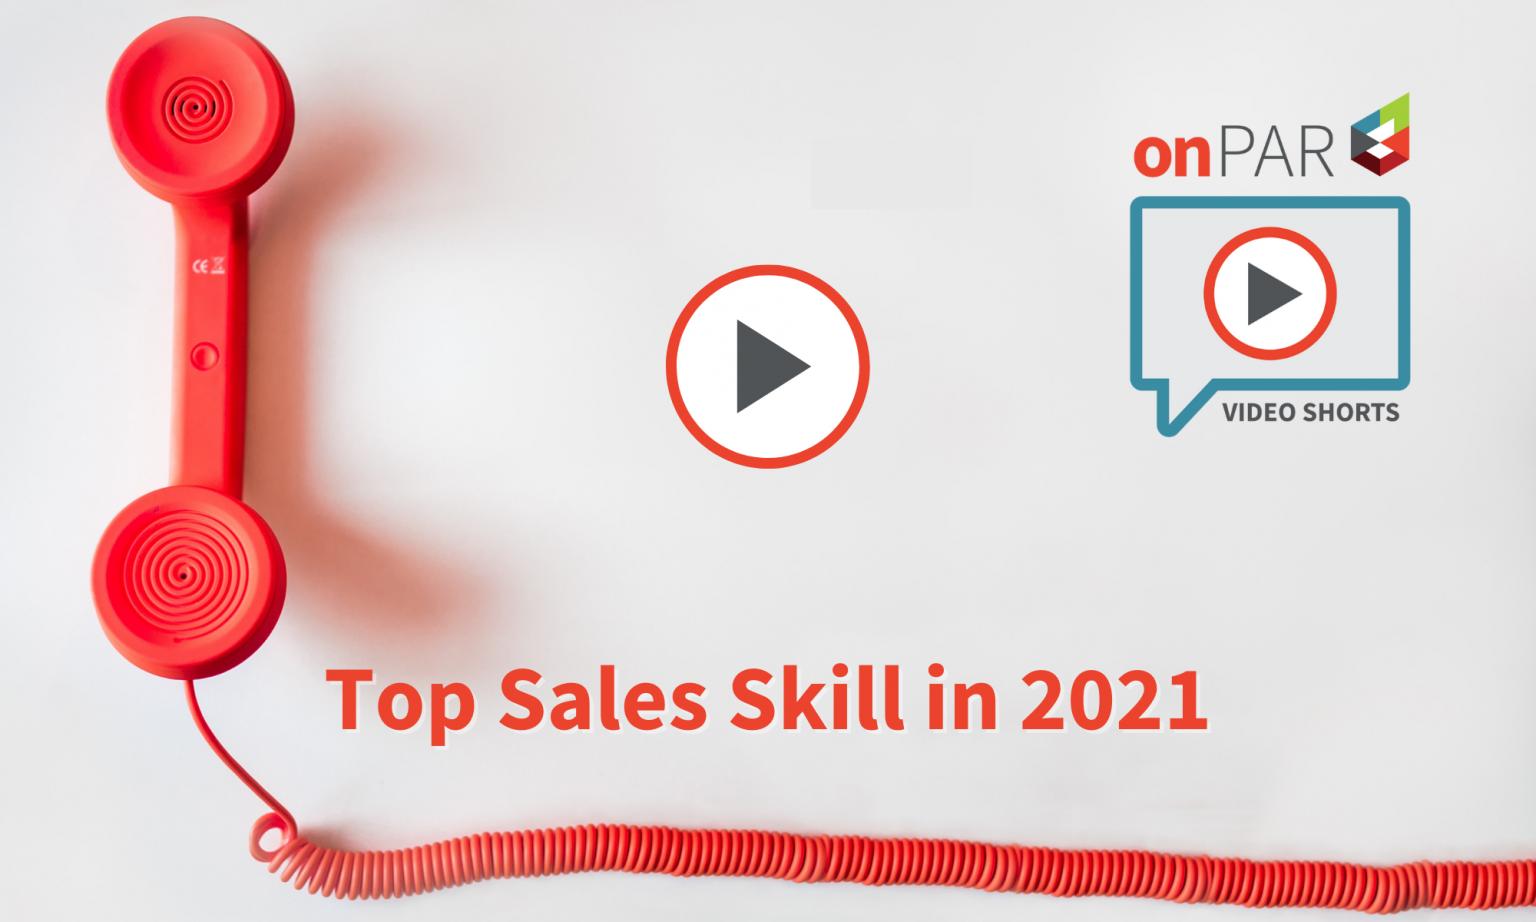 2000x1200 onPAR Post Image - Top Sales Skill